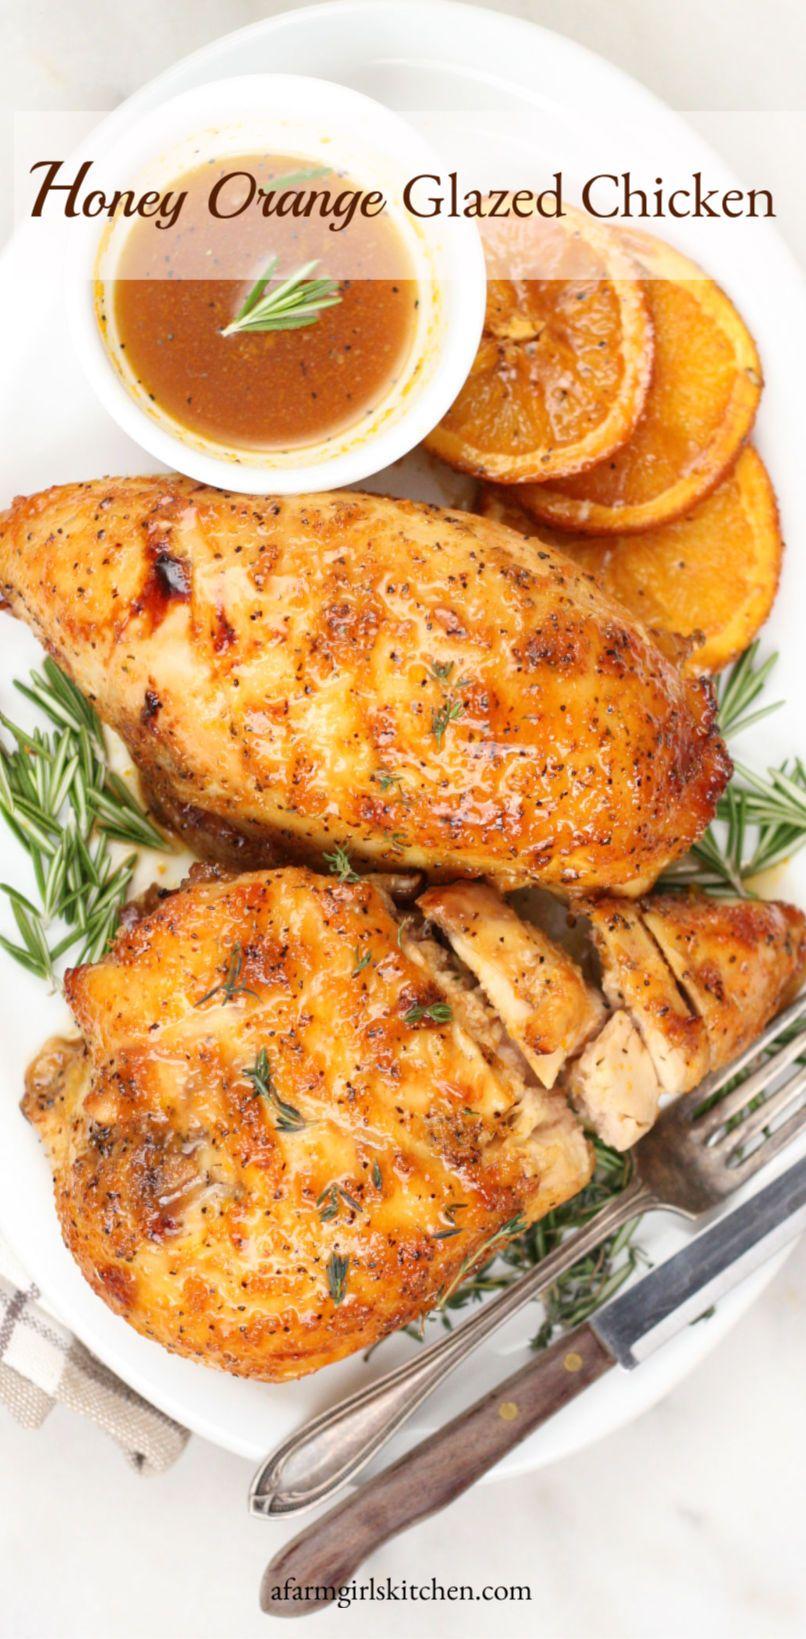 Easy Honey Orange Glazed Chicken Recipe | A Farmgirl's Kitchen